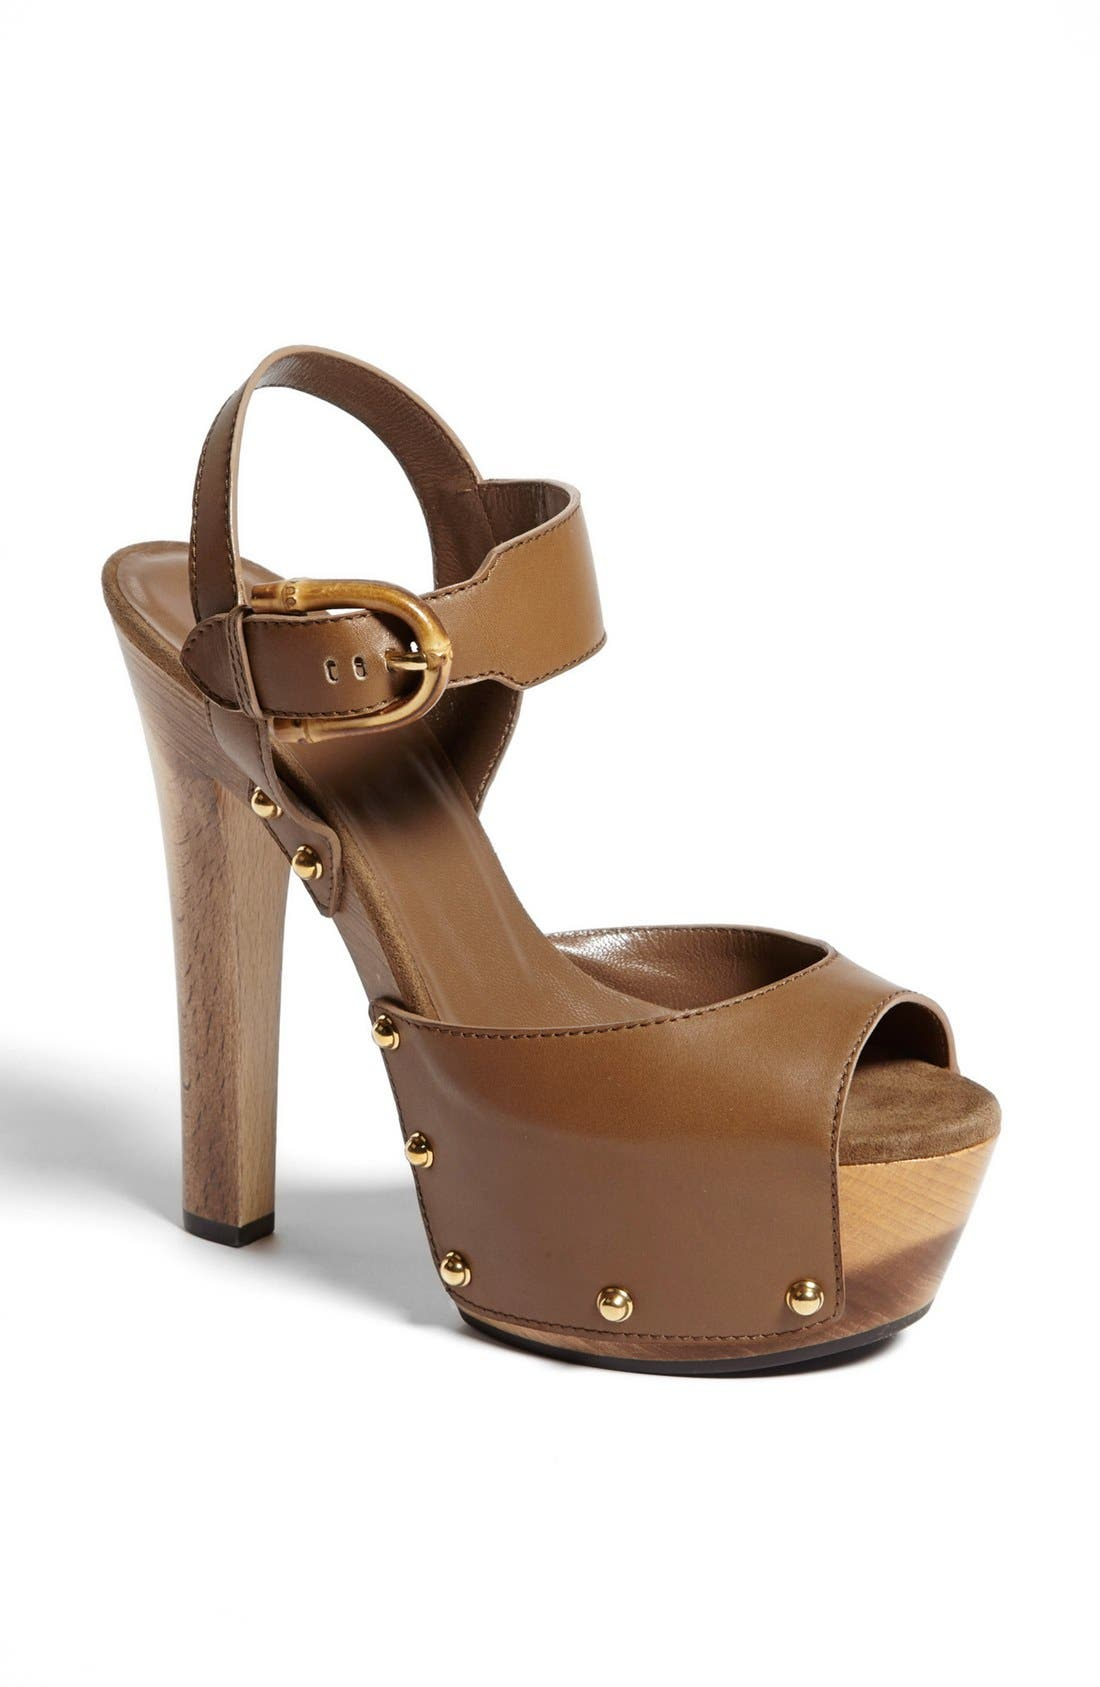 Alternate Image 1 Selected - Gucci 'Nadege' Clog Sandal